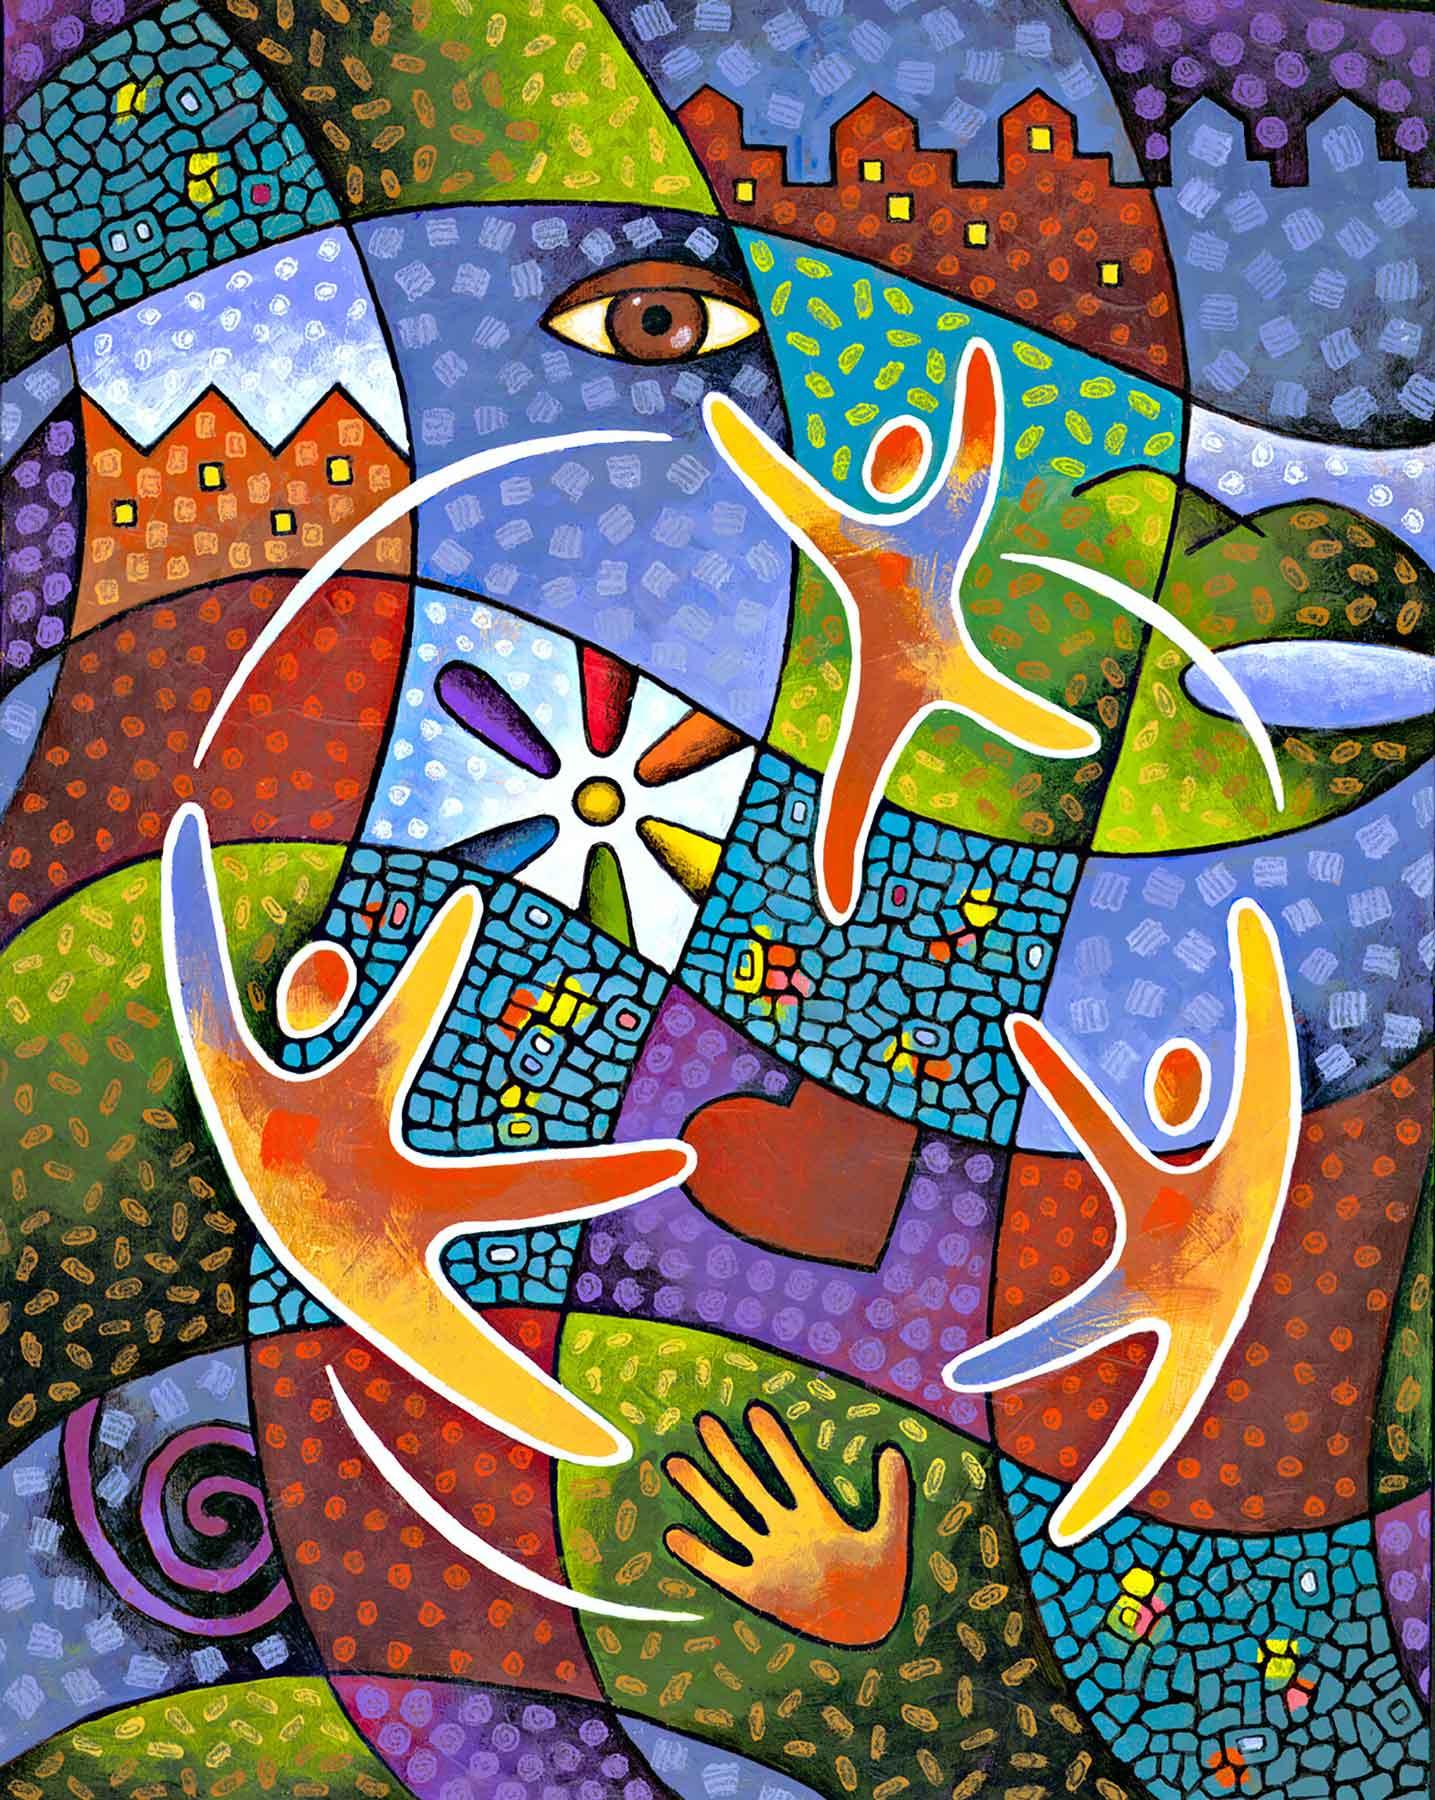 Jim Dryden / Rainbow Quilt / Rainbow Families of Minnesota